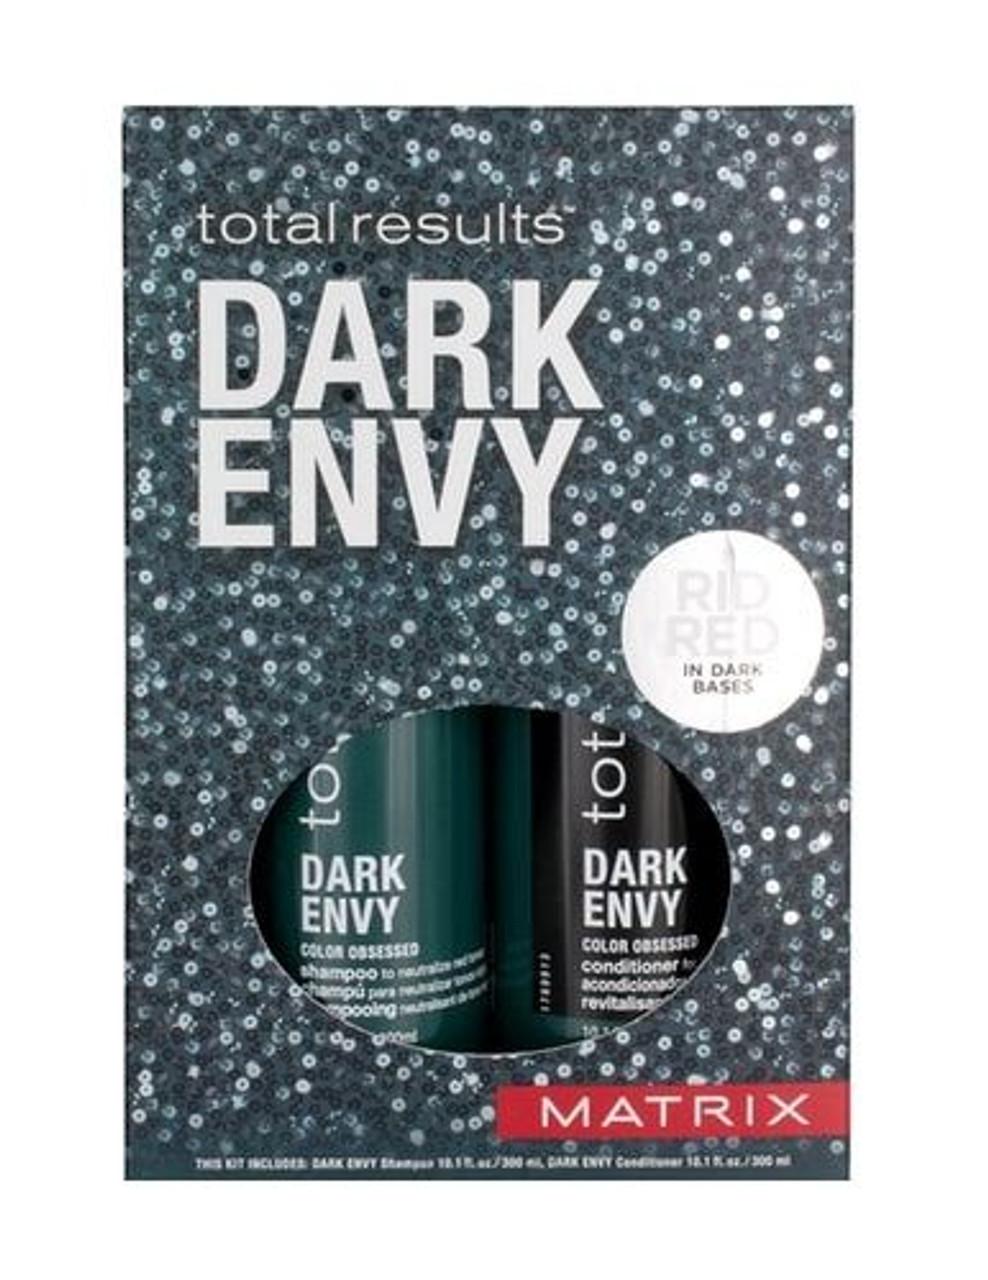 Matrix Total Results Dark Envy Shampoo 10.1 oz Conditioner 10.1 oz Gift Set